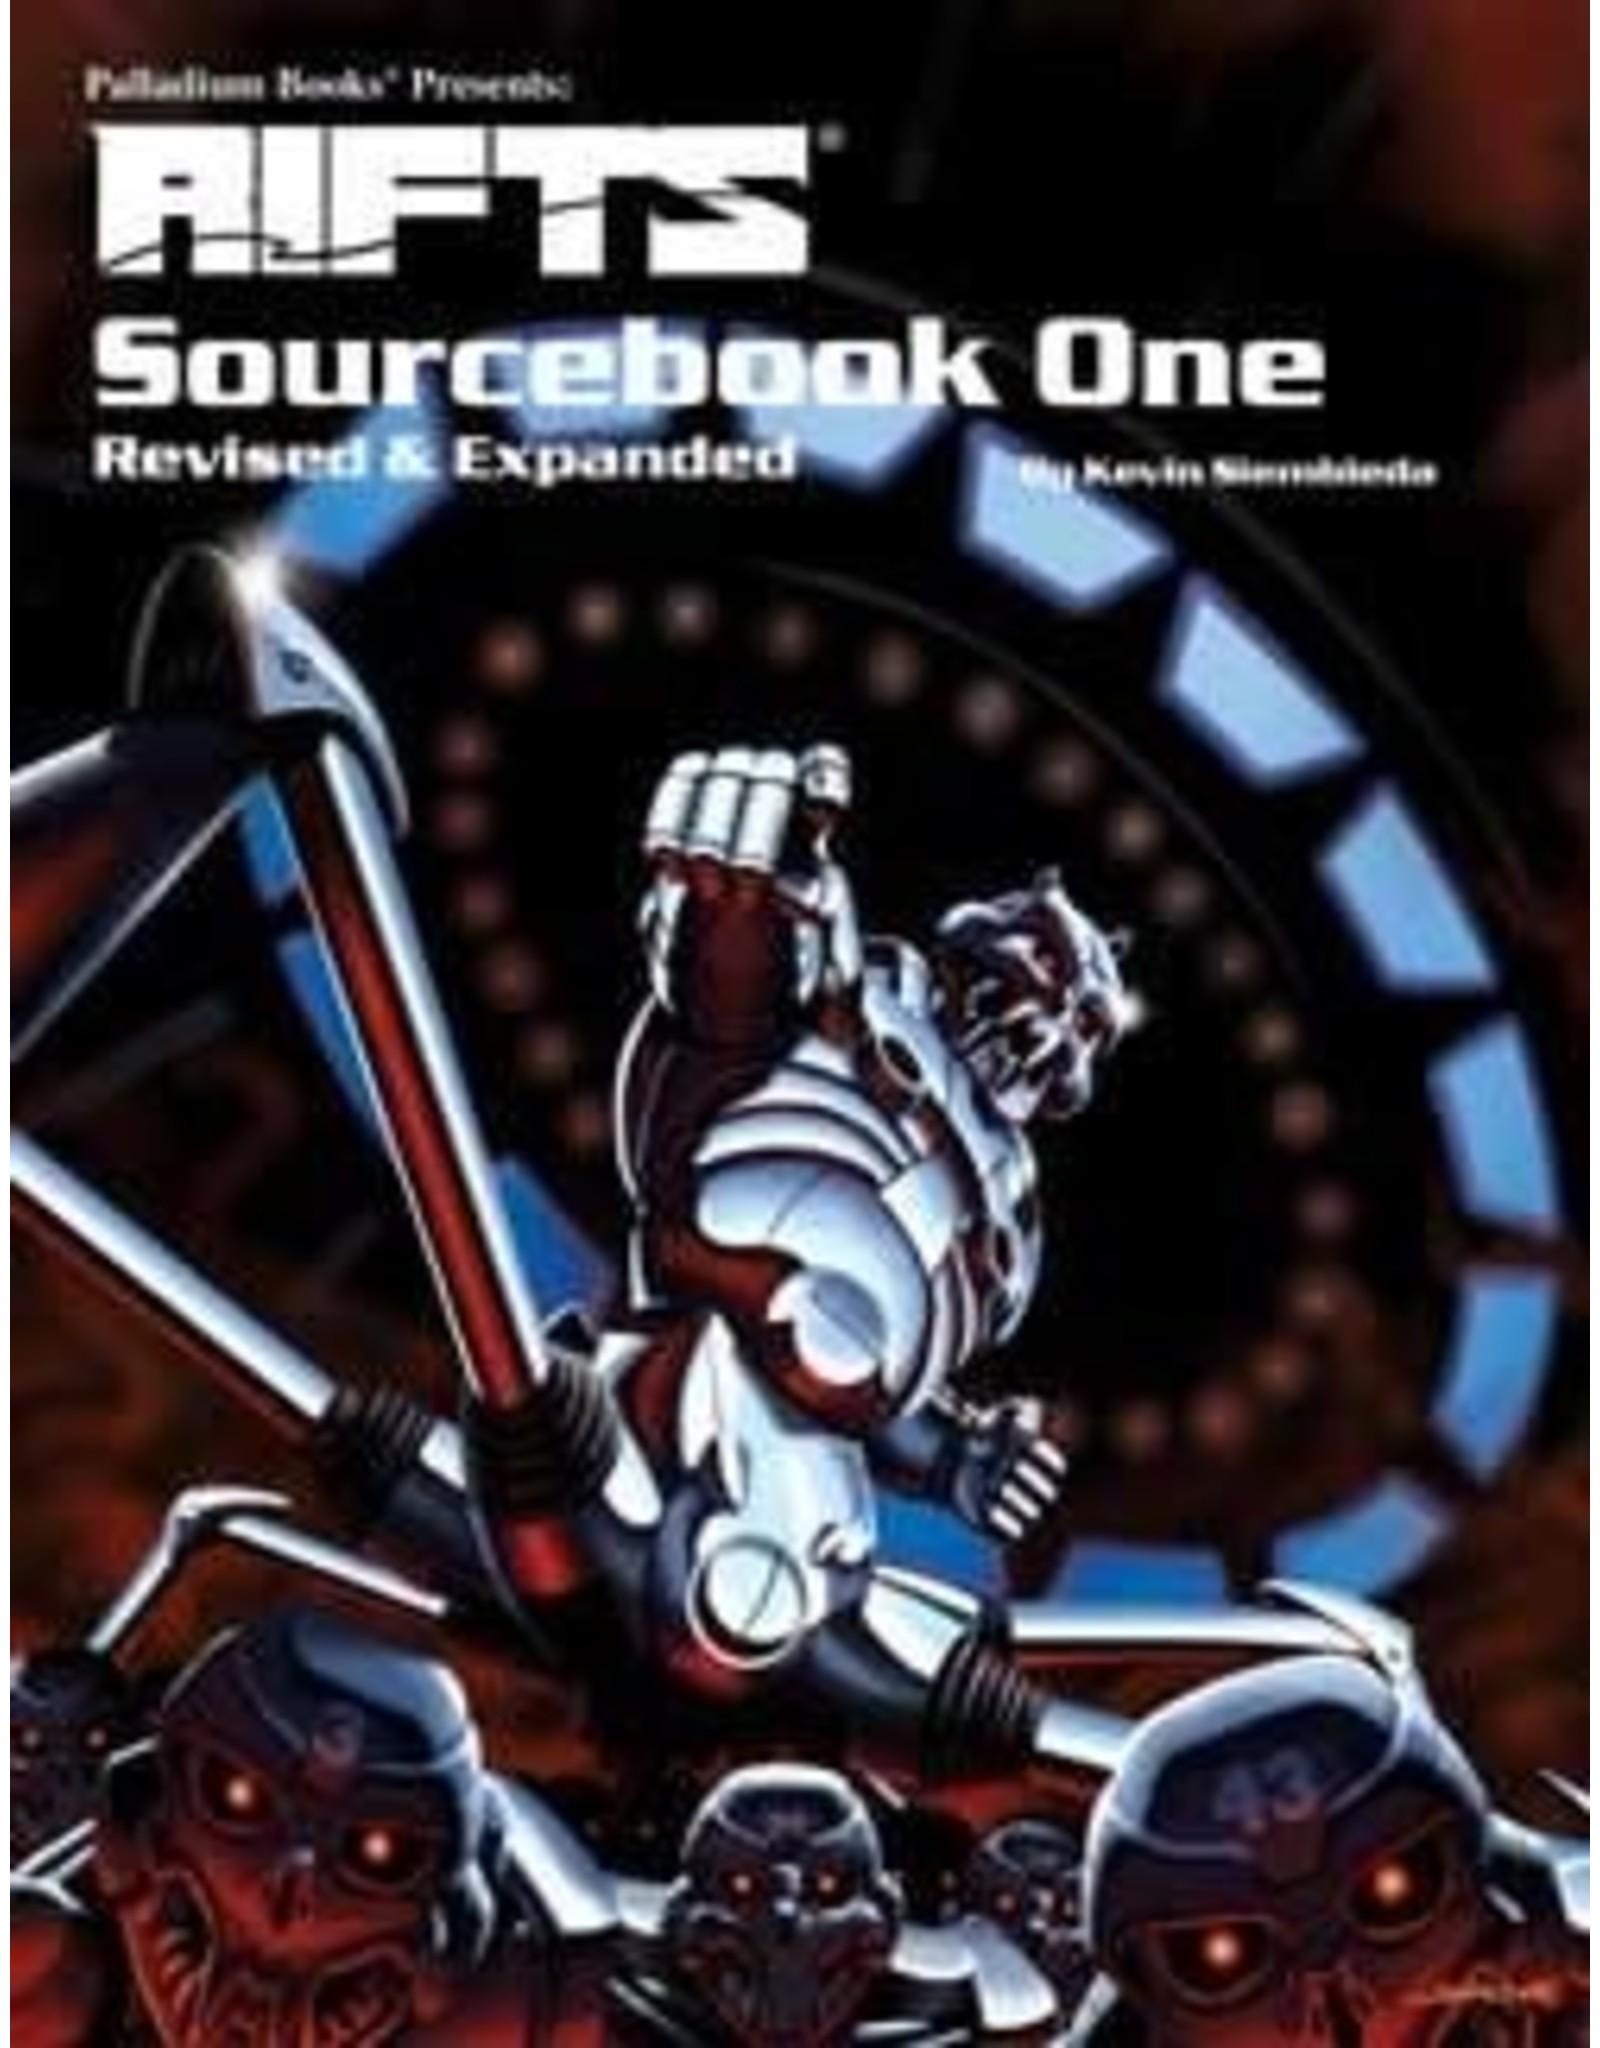 RIfts RPG Sourcebook 1 Revised & Expanded